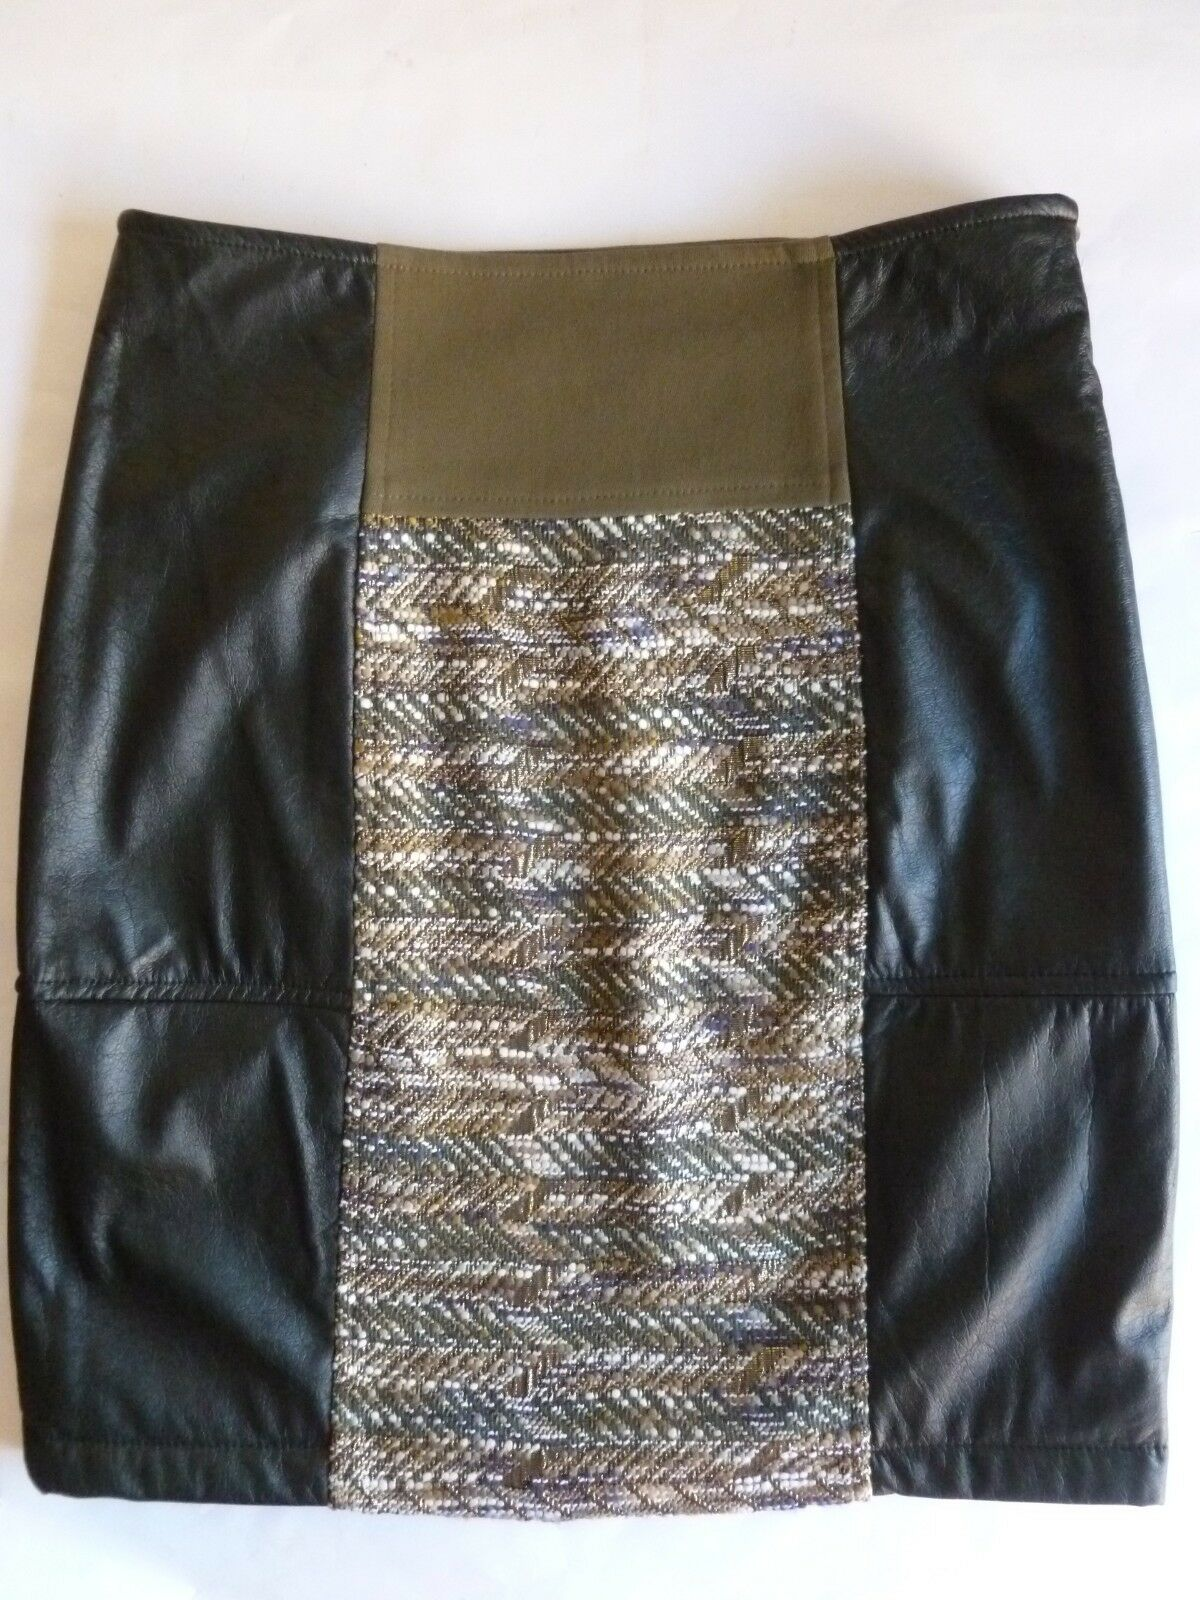 New faux leather skirt Max Mara Intrend 42 IT, Gonna Max Mara Intrend tg42 NUOVA